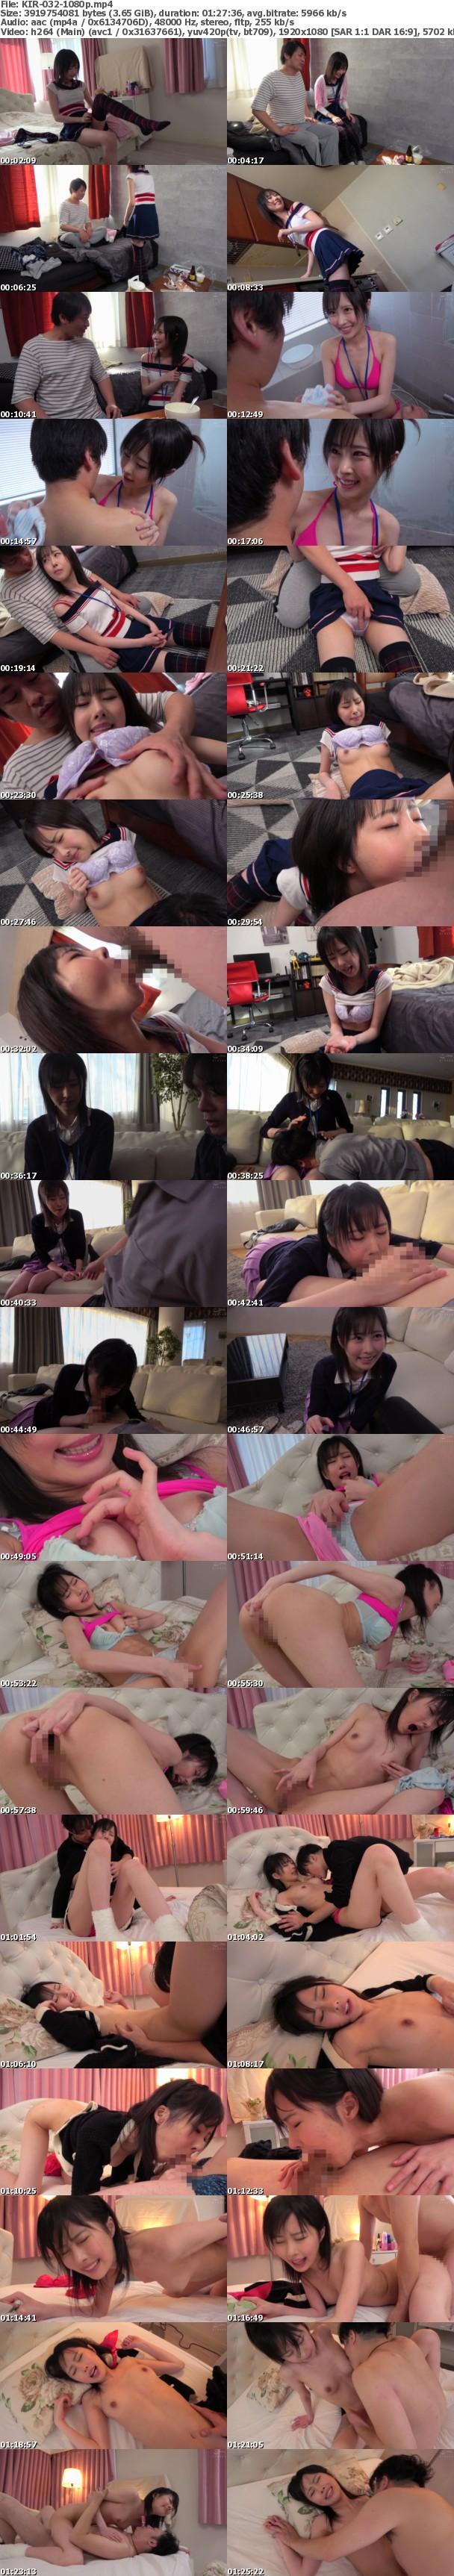 (Full HD) KIR-032 レンタル妹 はじめました「ご自宅出張可、ボディタッチはNGですよ」山口葉瑠